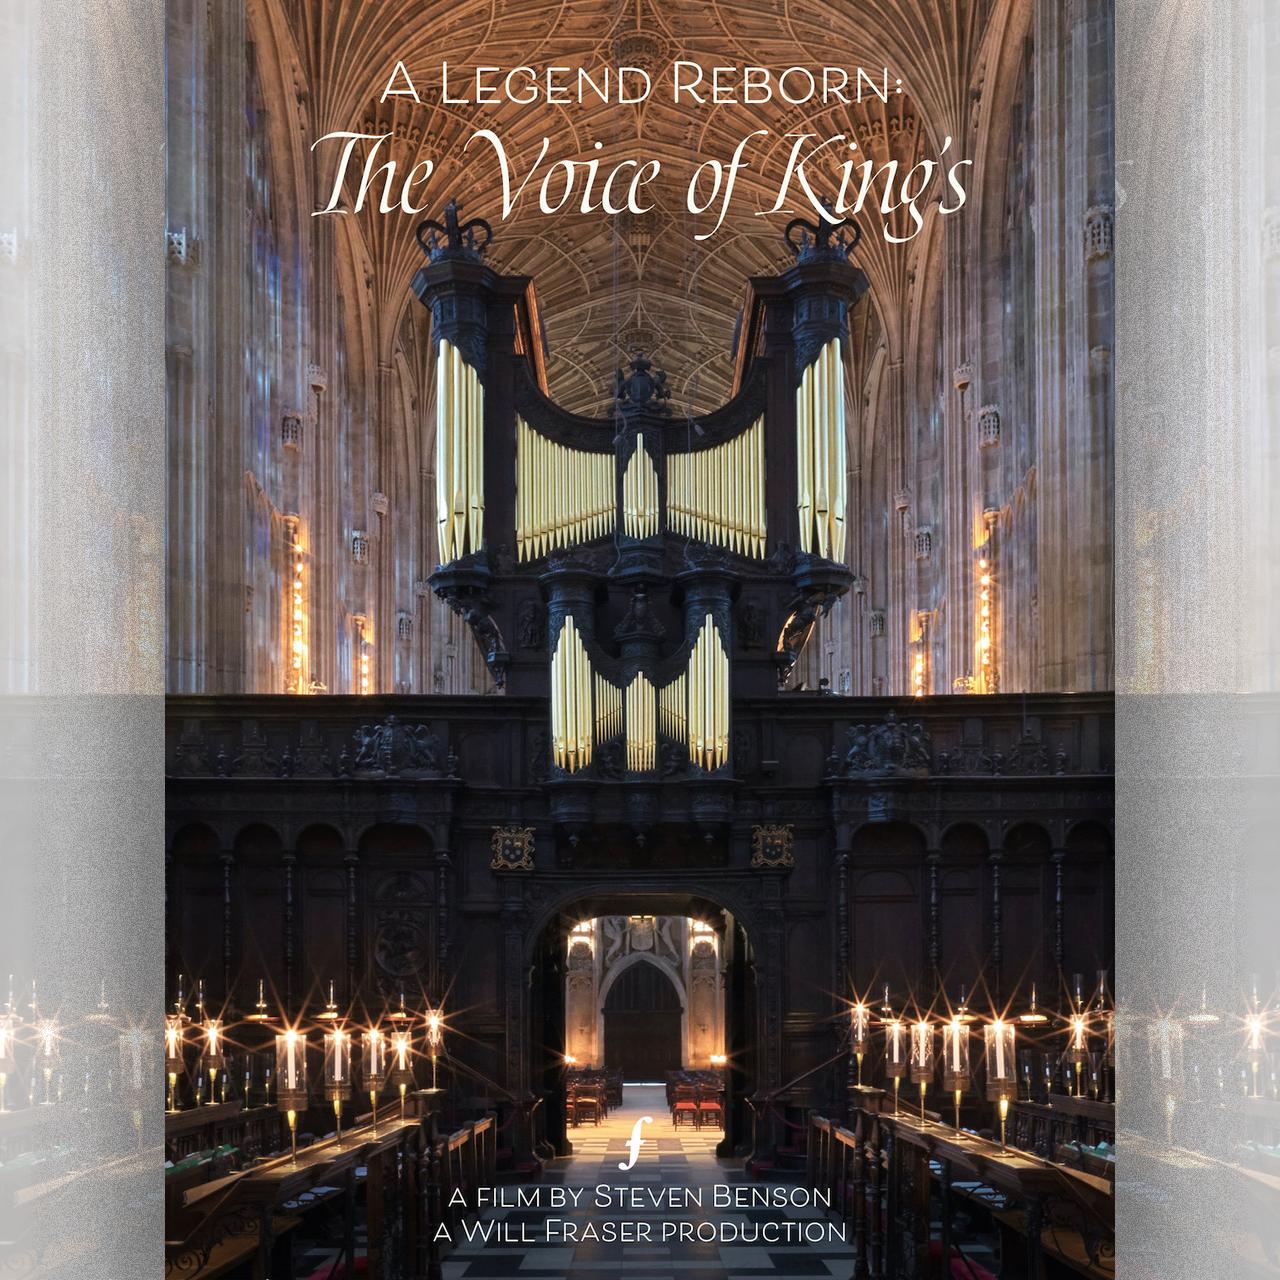 A Legend Reborn organ DVD cover